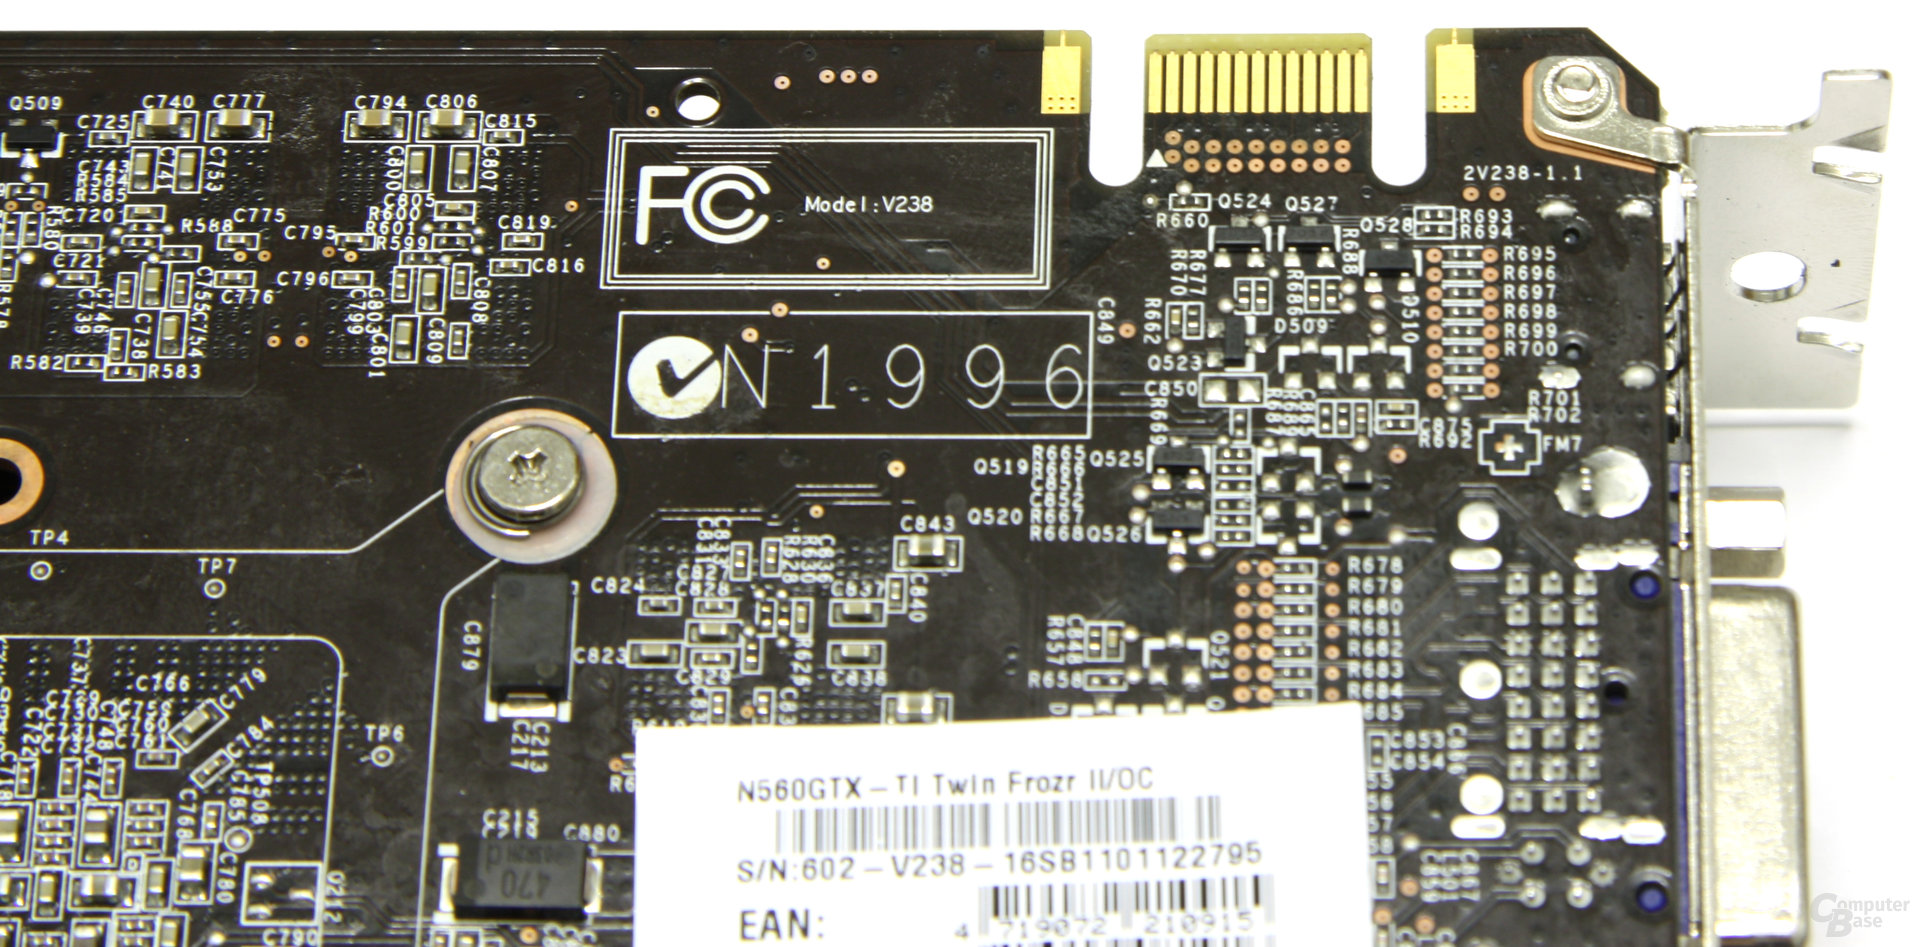 GeForce GTX 560 Ti TFII OC SLI-Anschluss